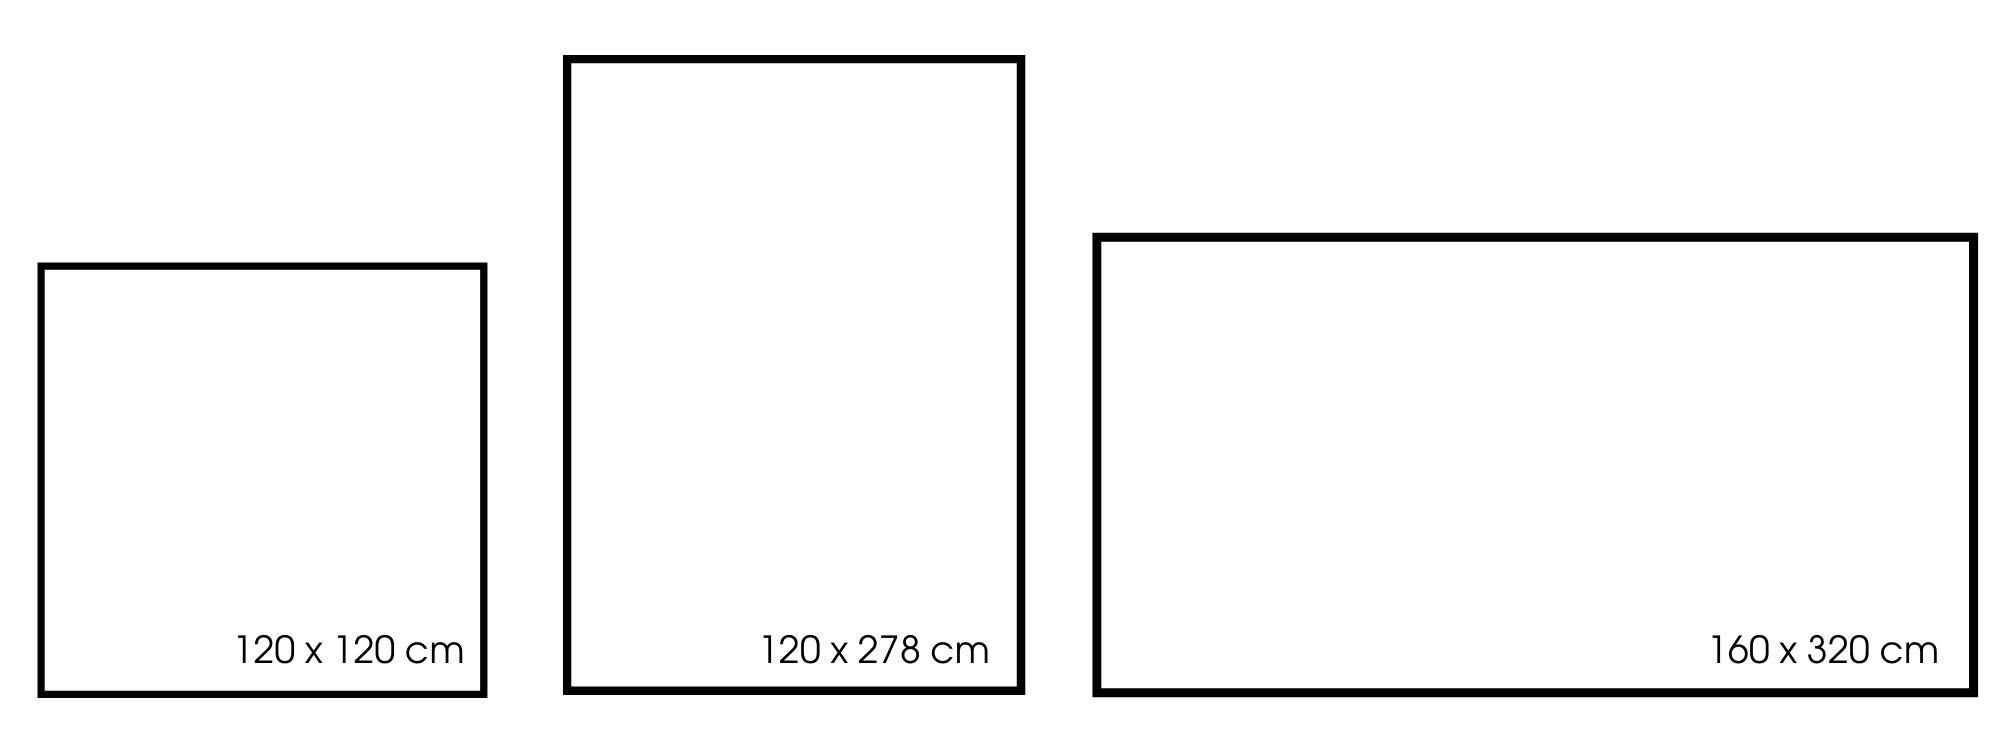 Größen Chimica 2